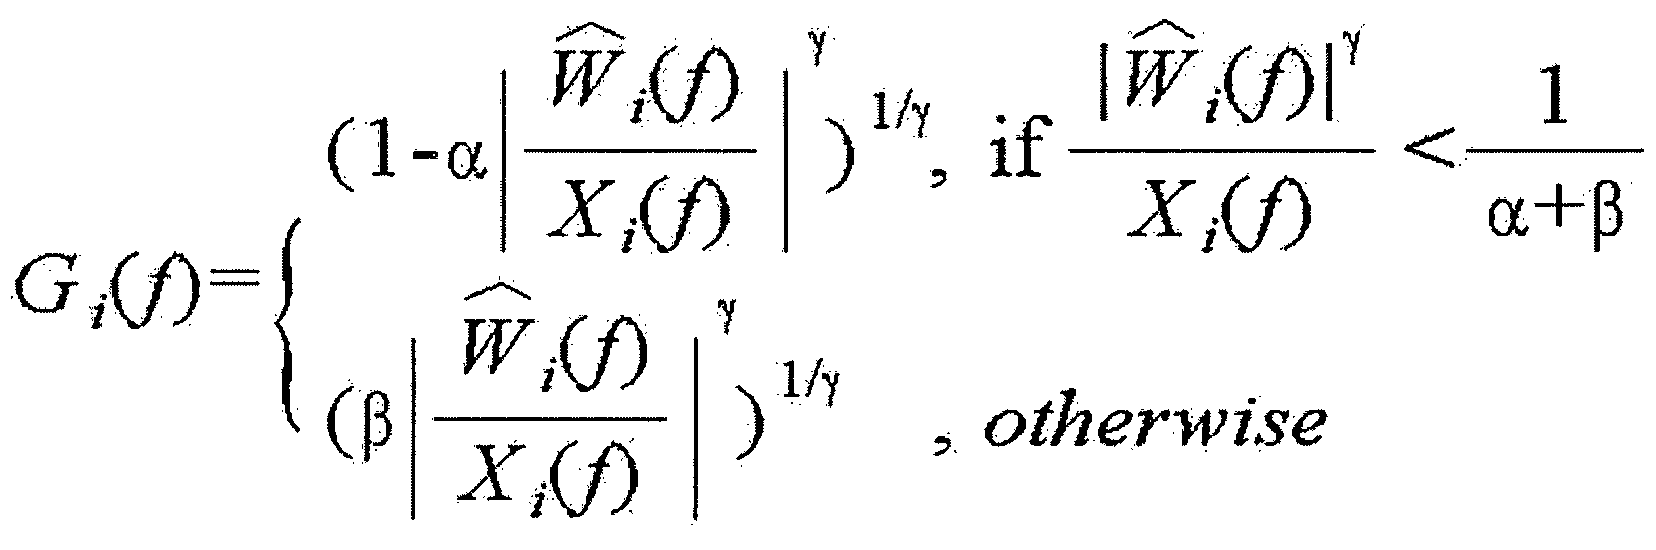 Figure WO-DOC-79